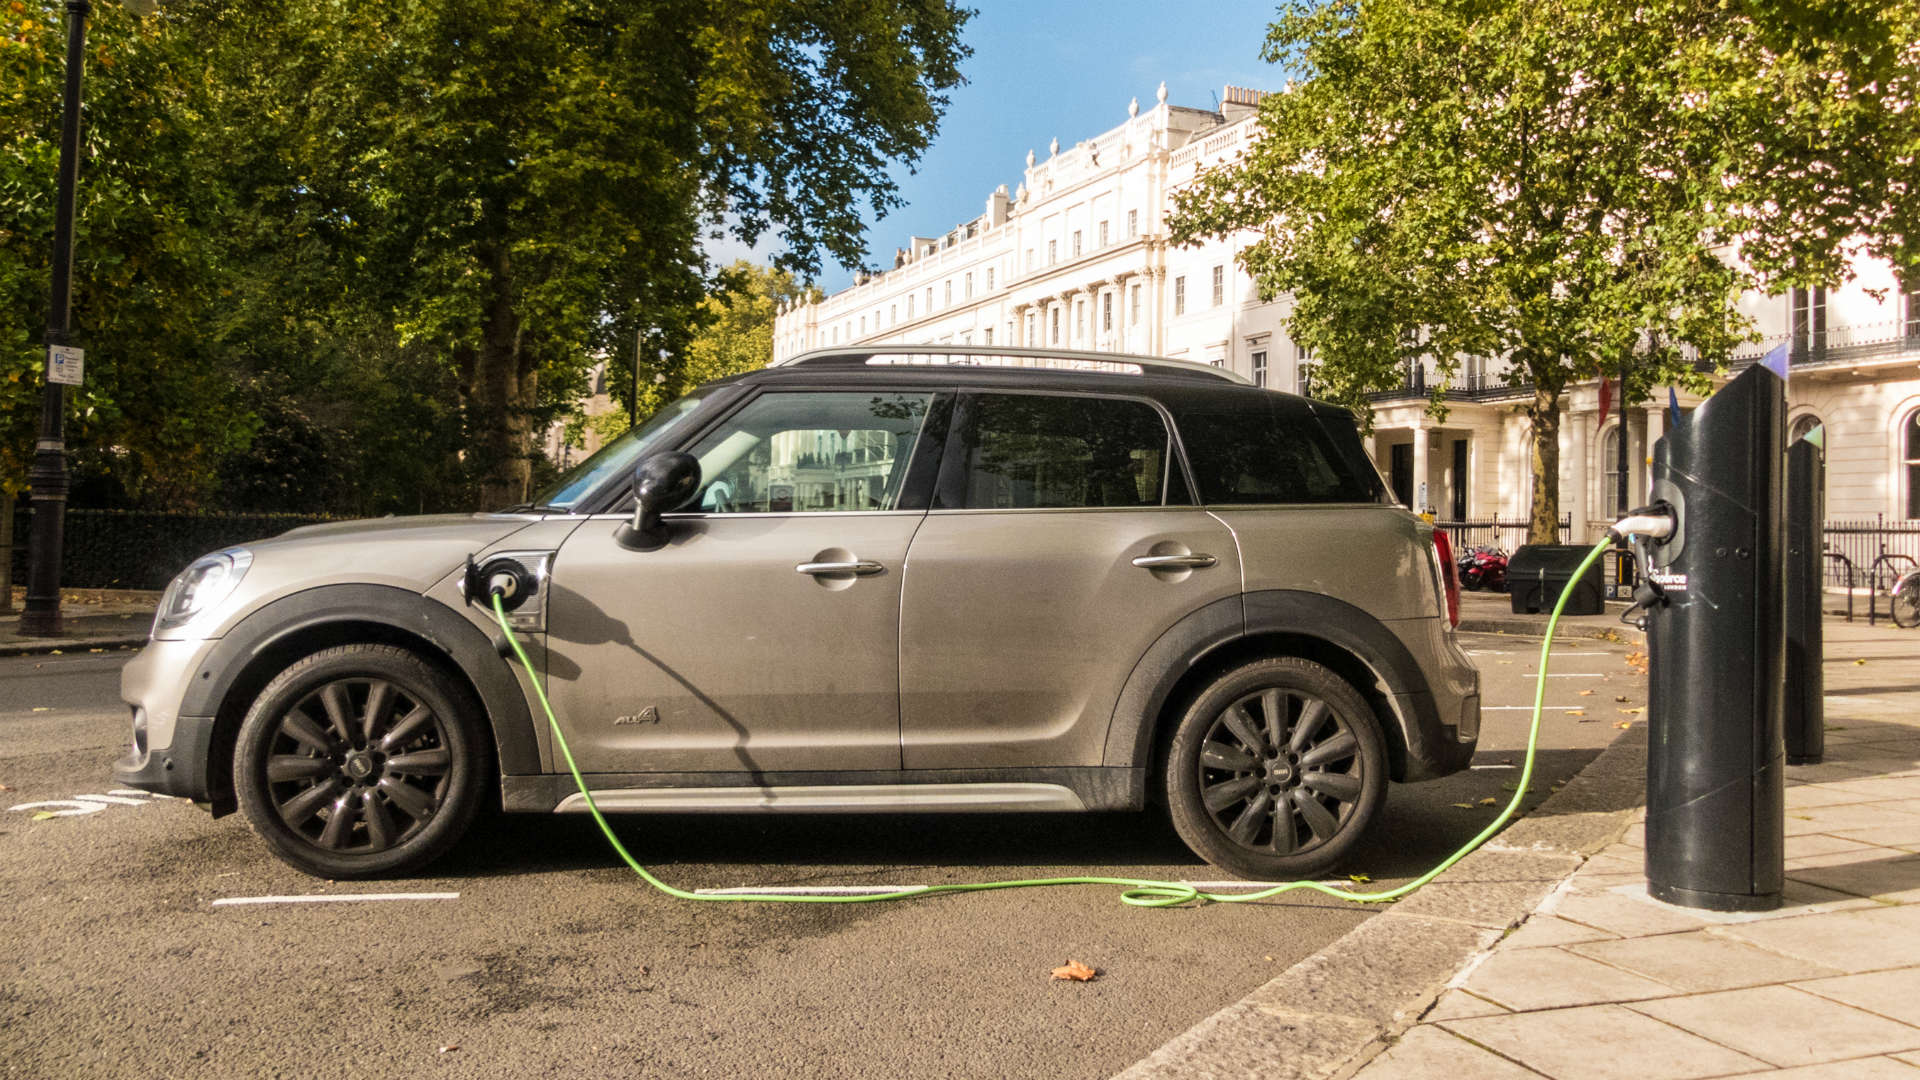 Mini Countryman PHEV charging in London